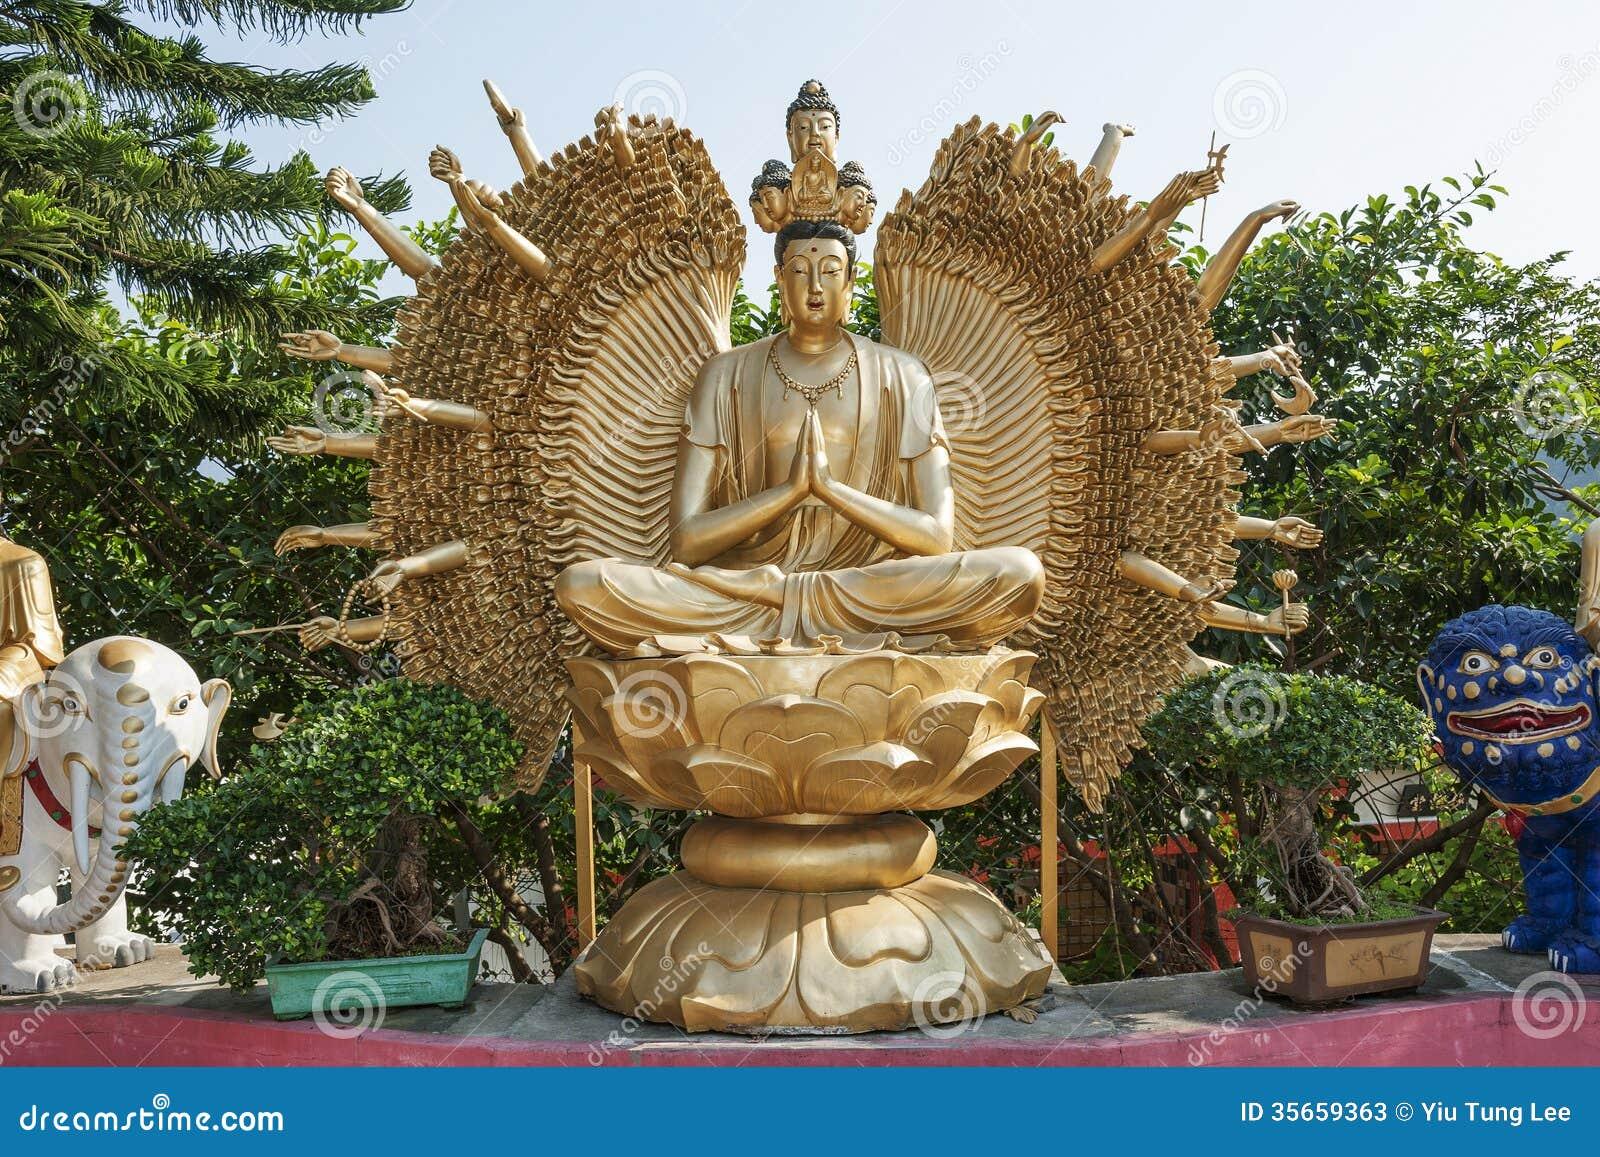 Thousand hands Buddha statue